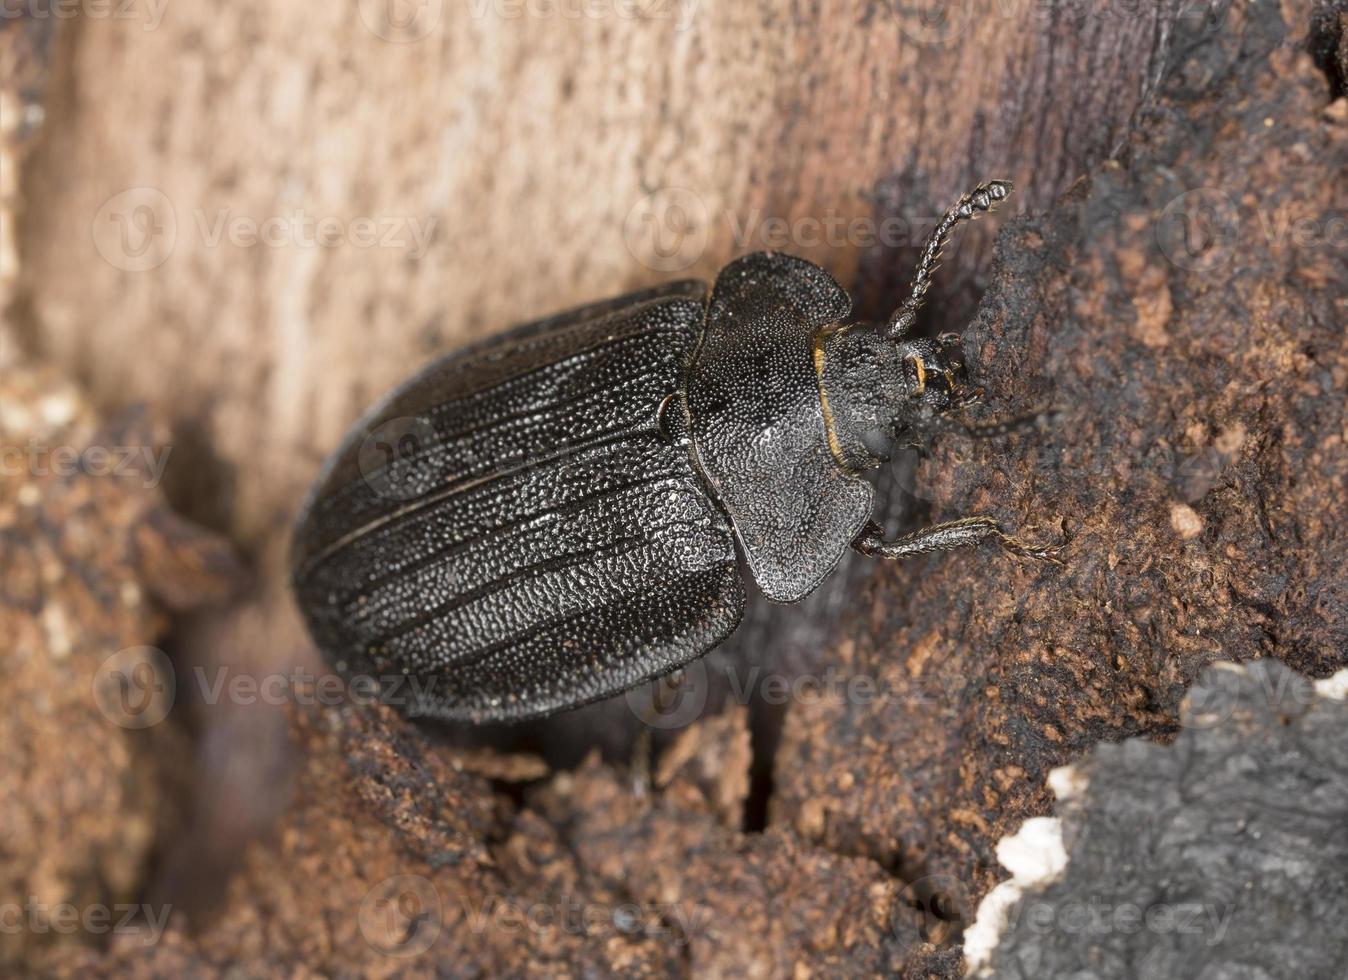 peltis grossa, trogossitidae na madeira foto